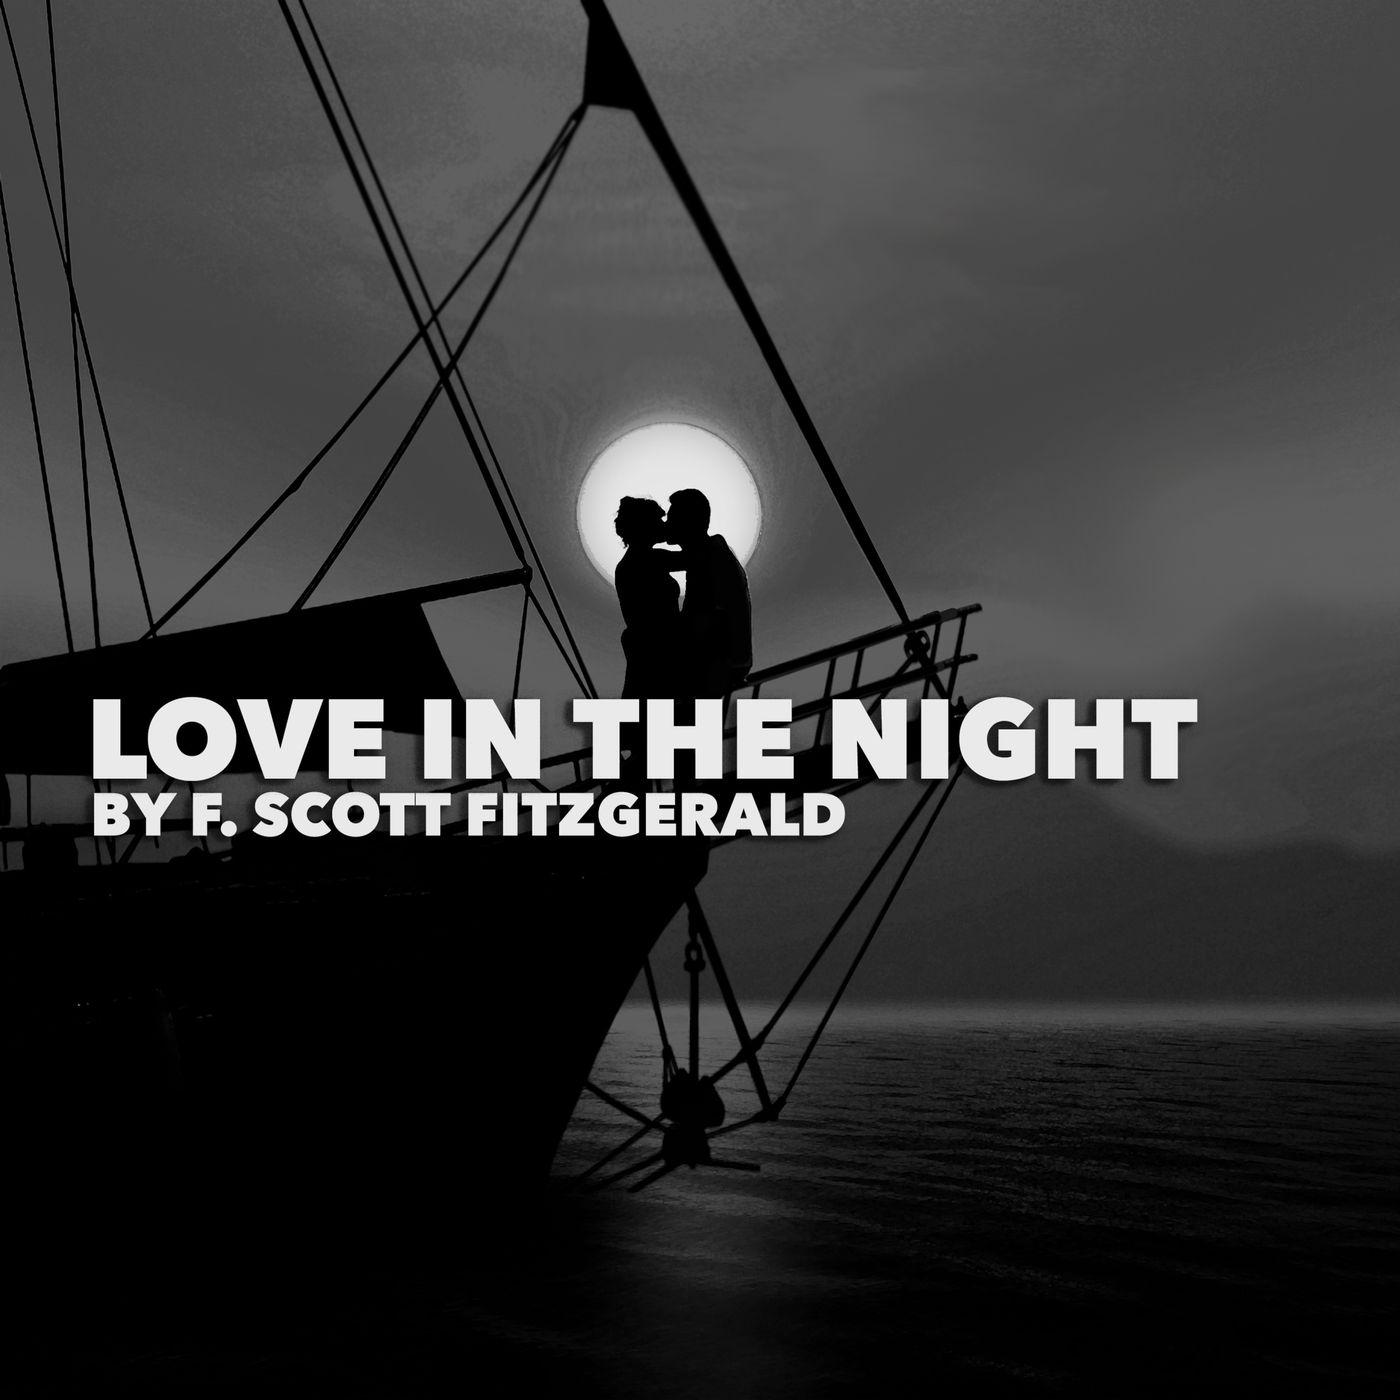 Love in the Night by F. Scott Fitzgerald